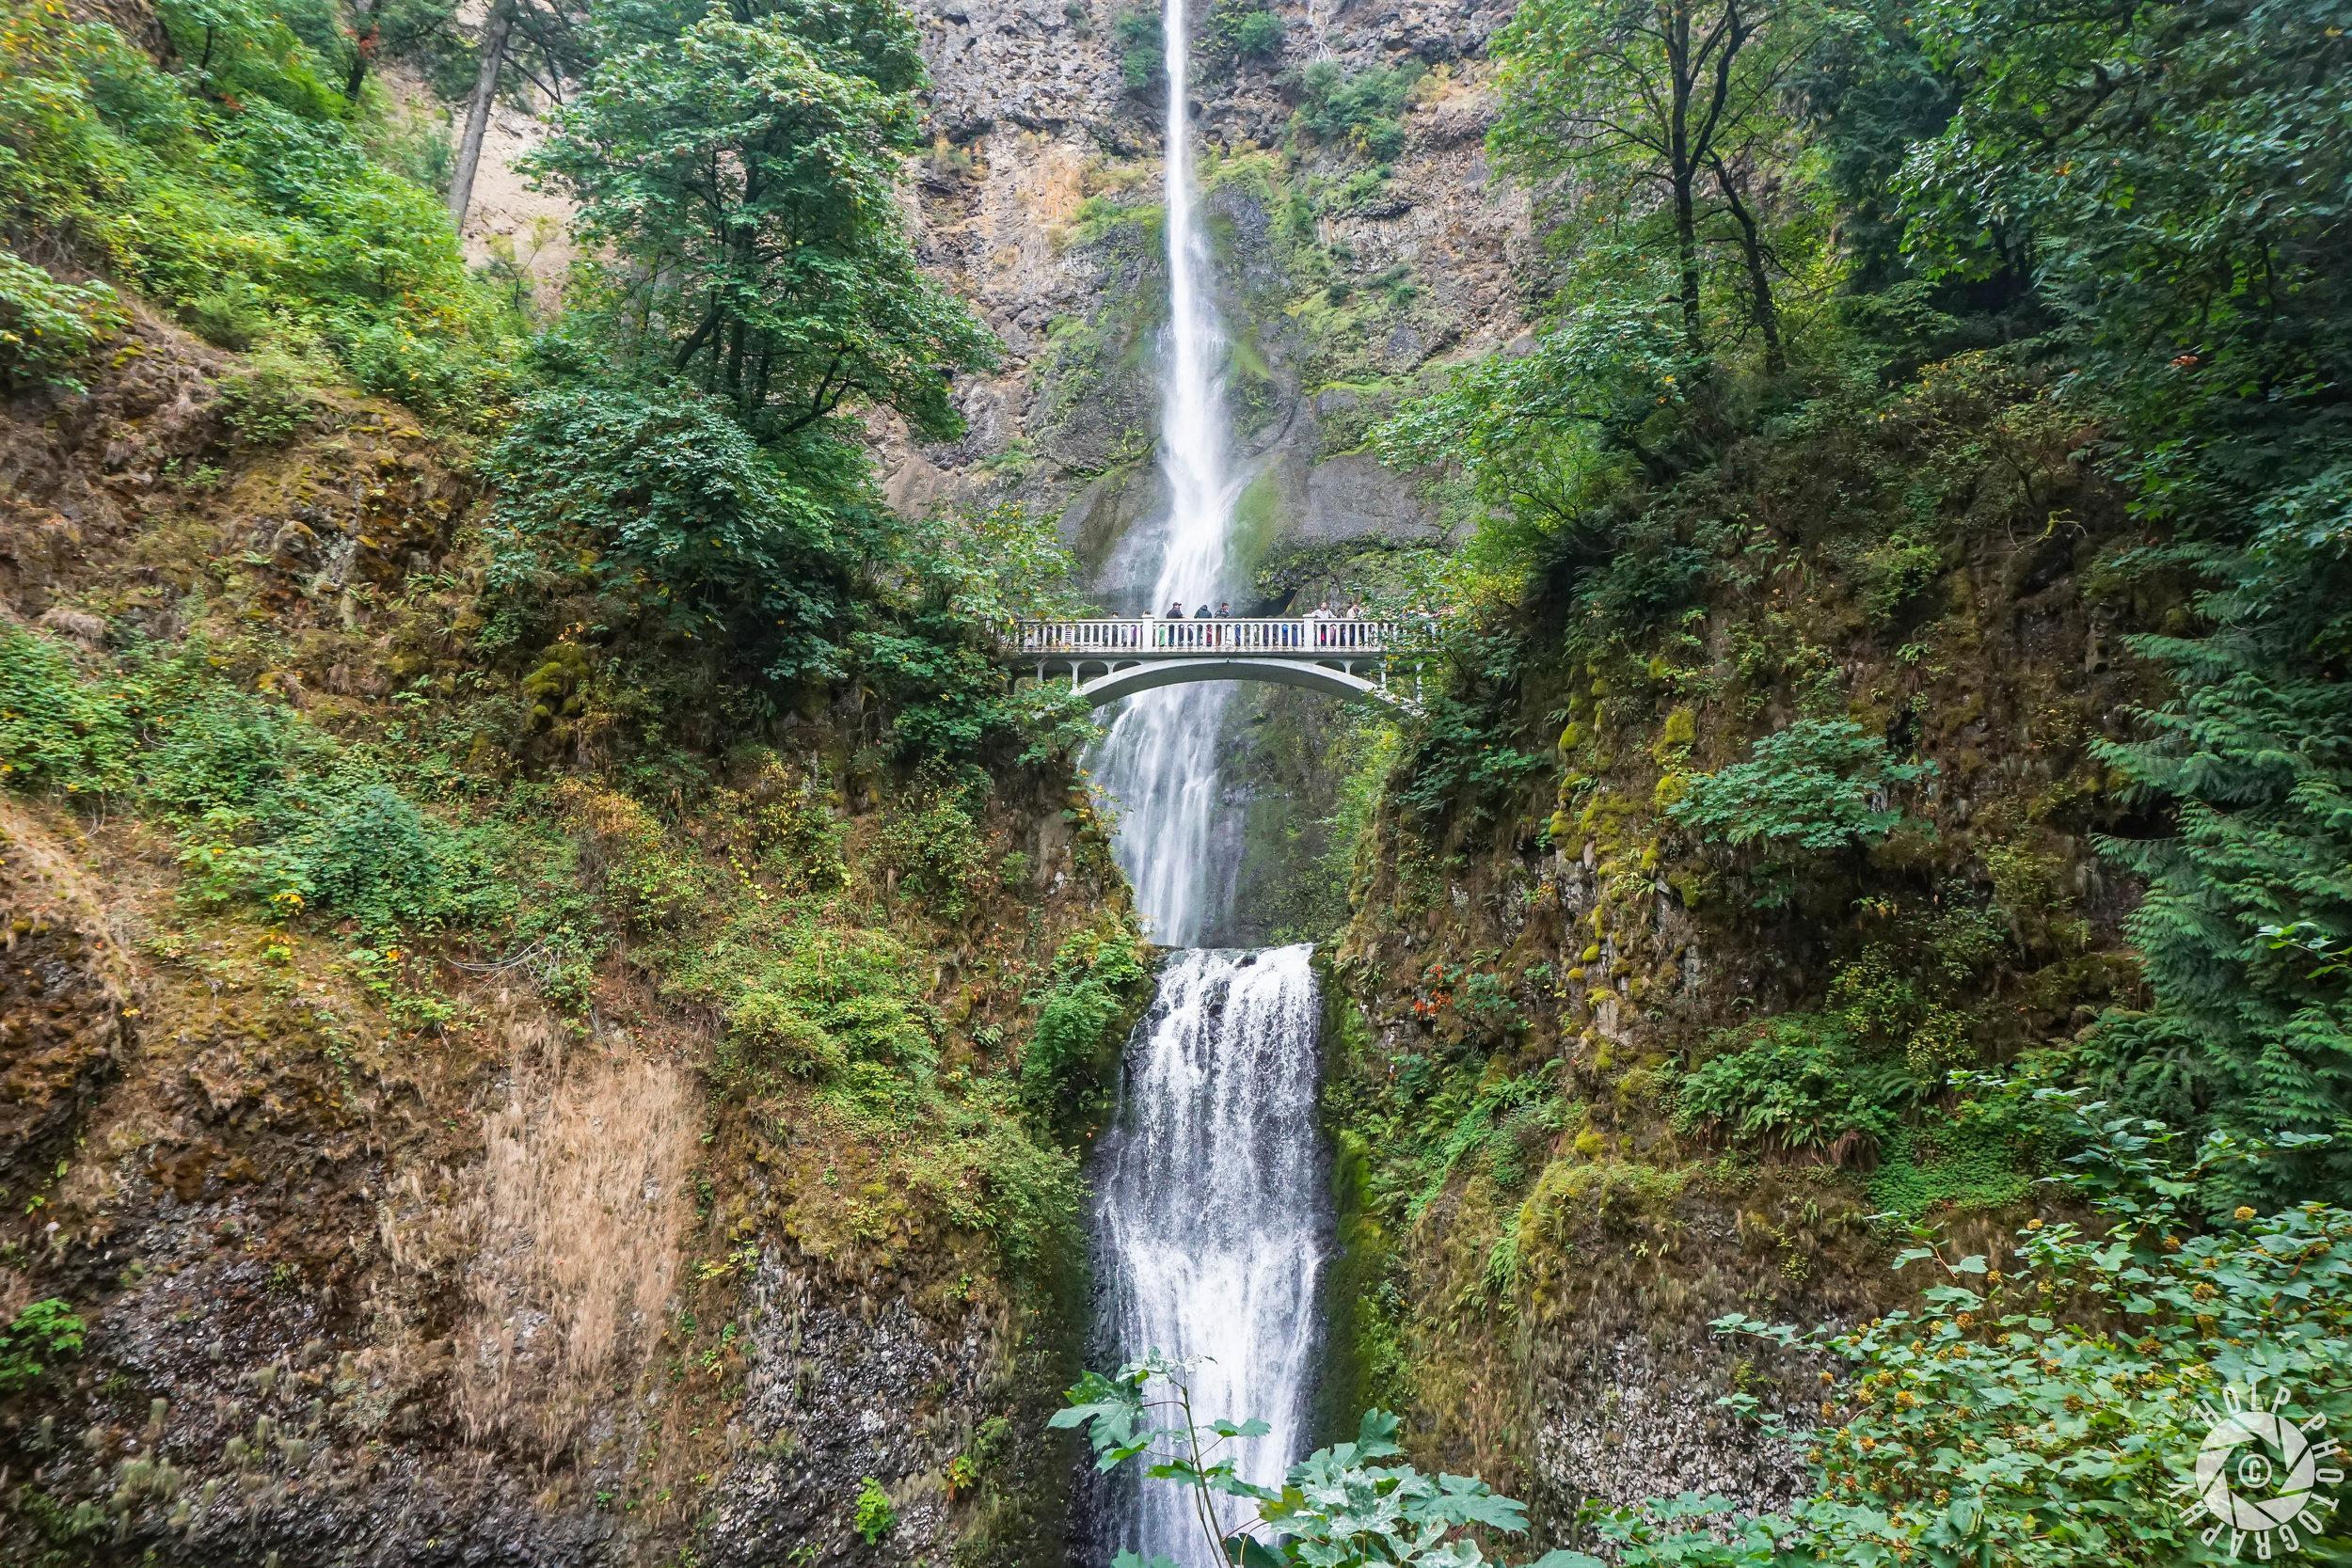 This photo was taken at Multnomah Falls outside Portland.